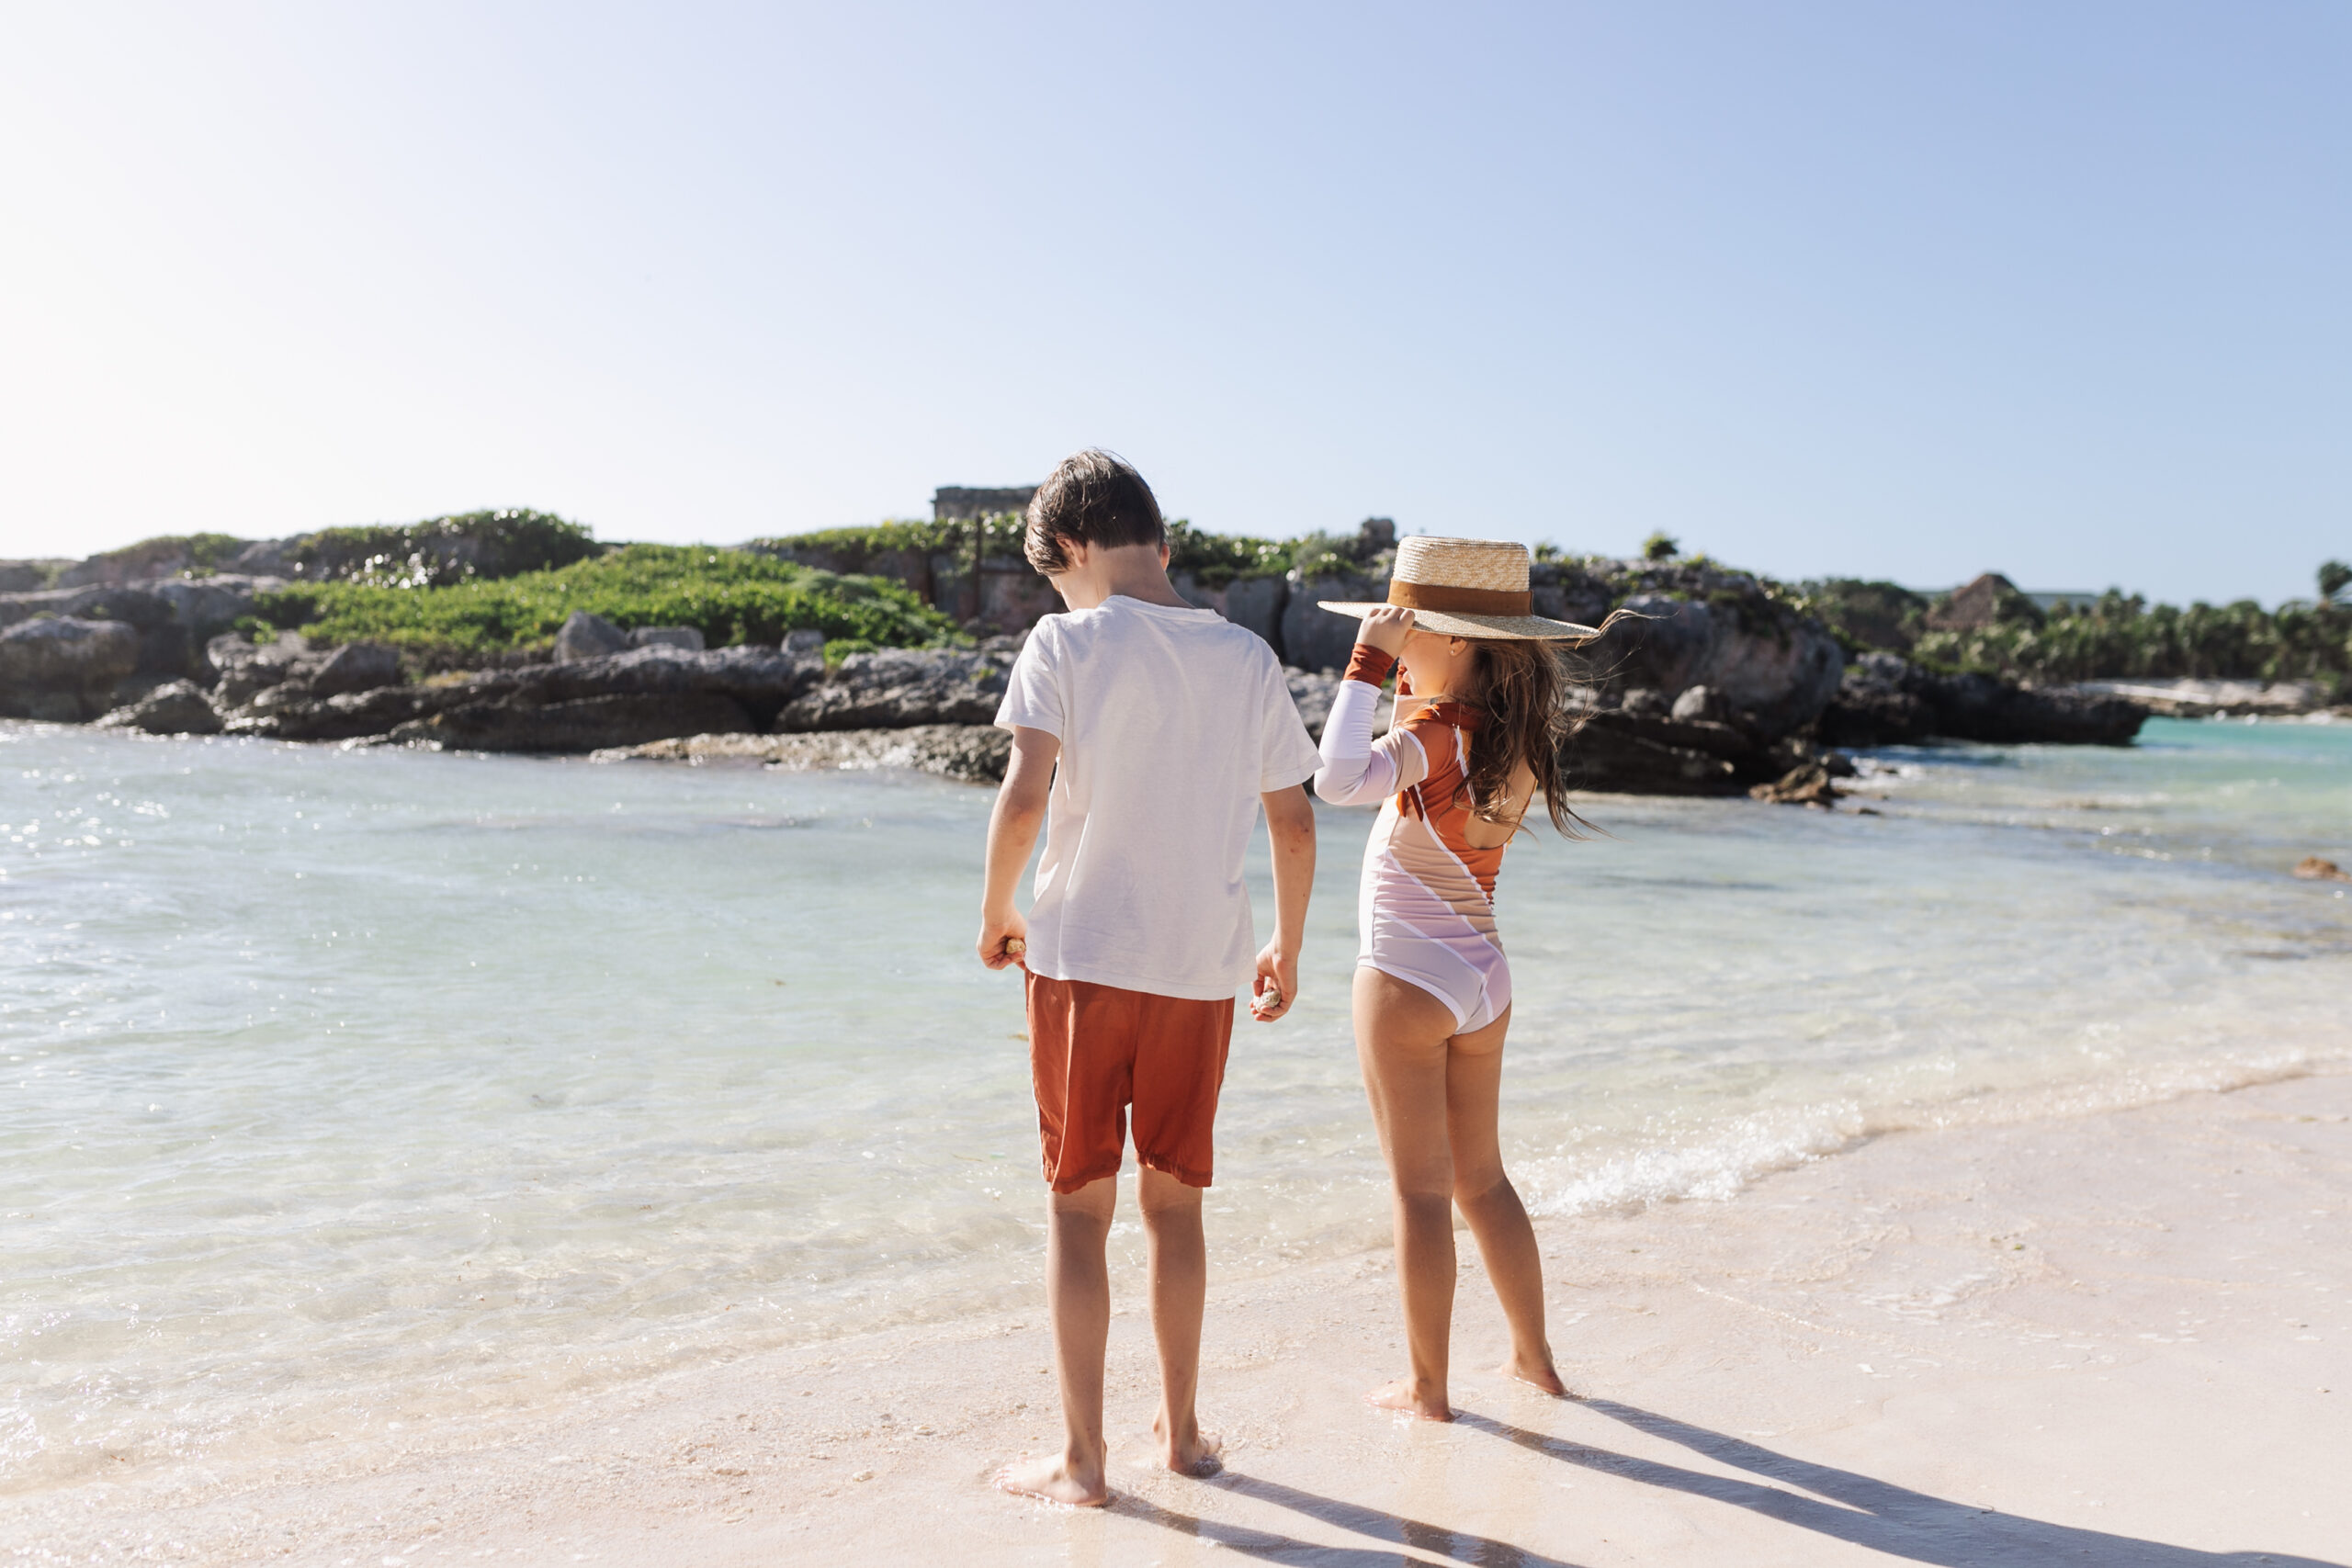 the kids by the beach in the riviera maya #theldltravles #thelovedesignedlife #beachbabies #travelwithkids